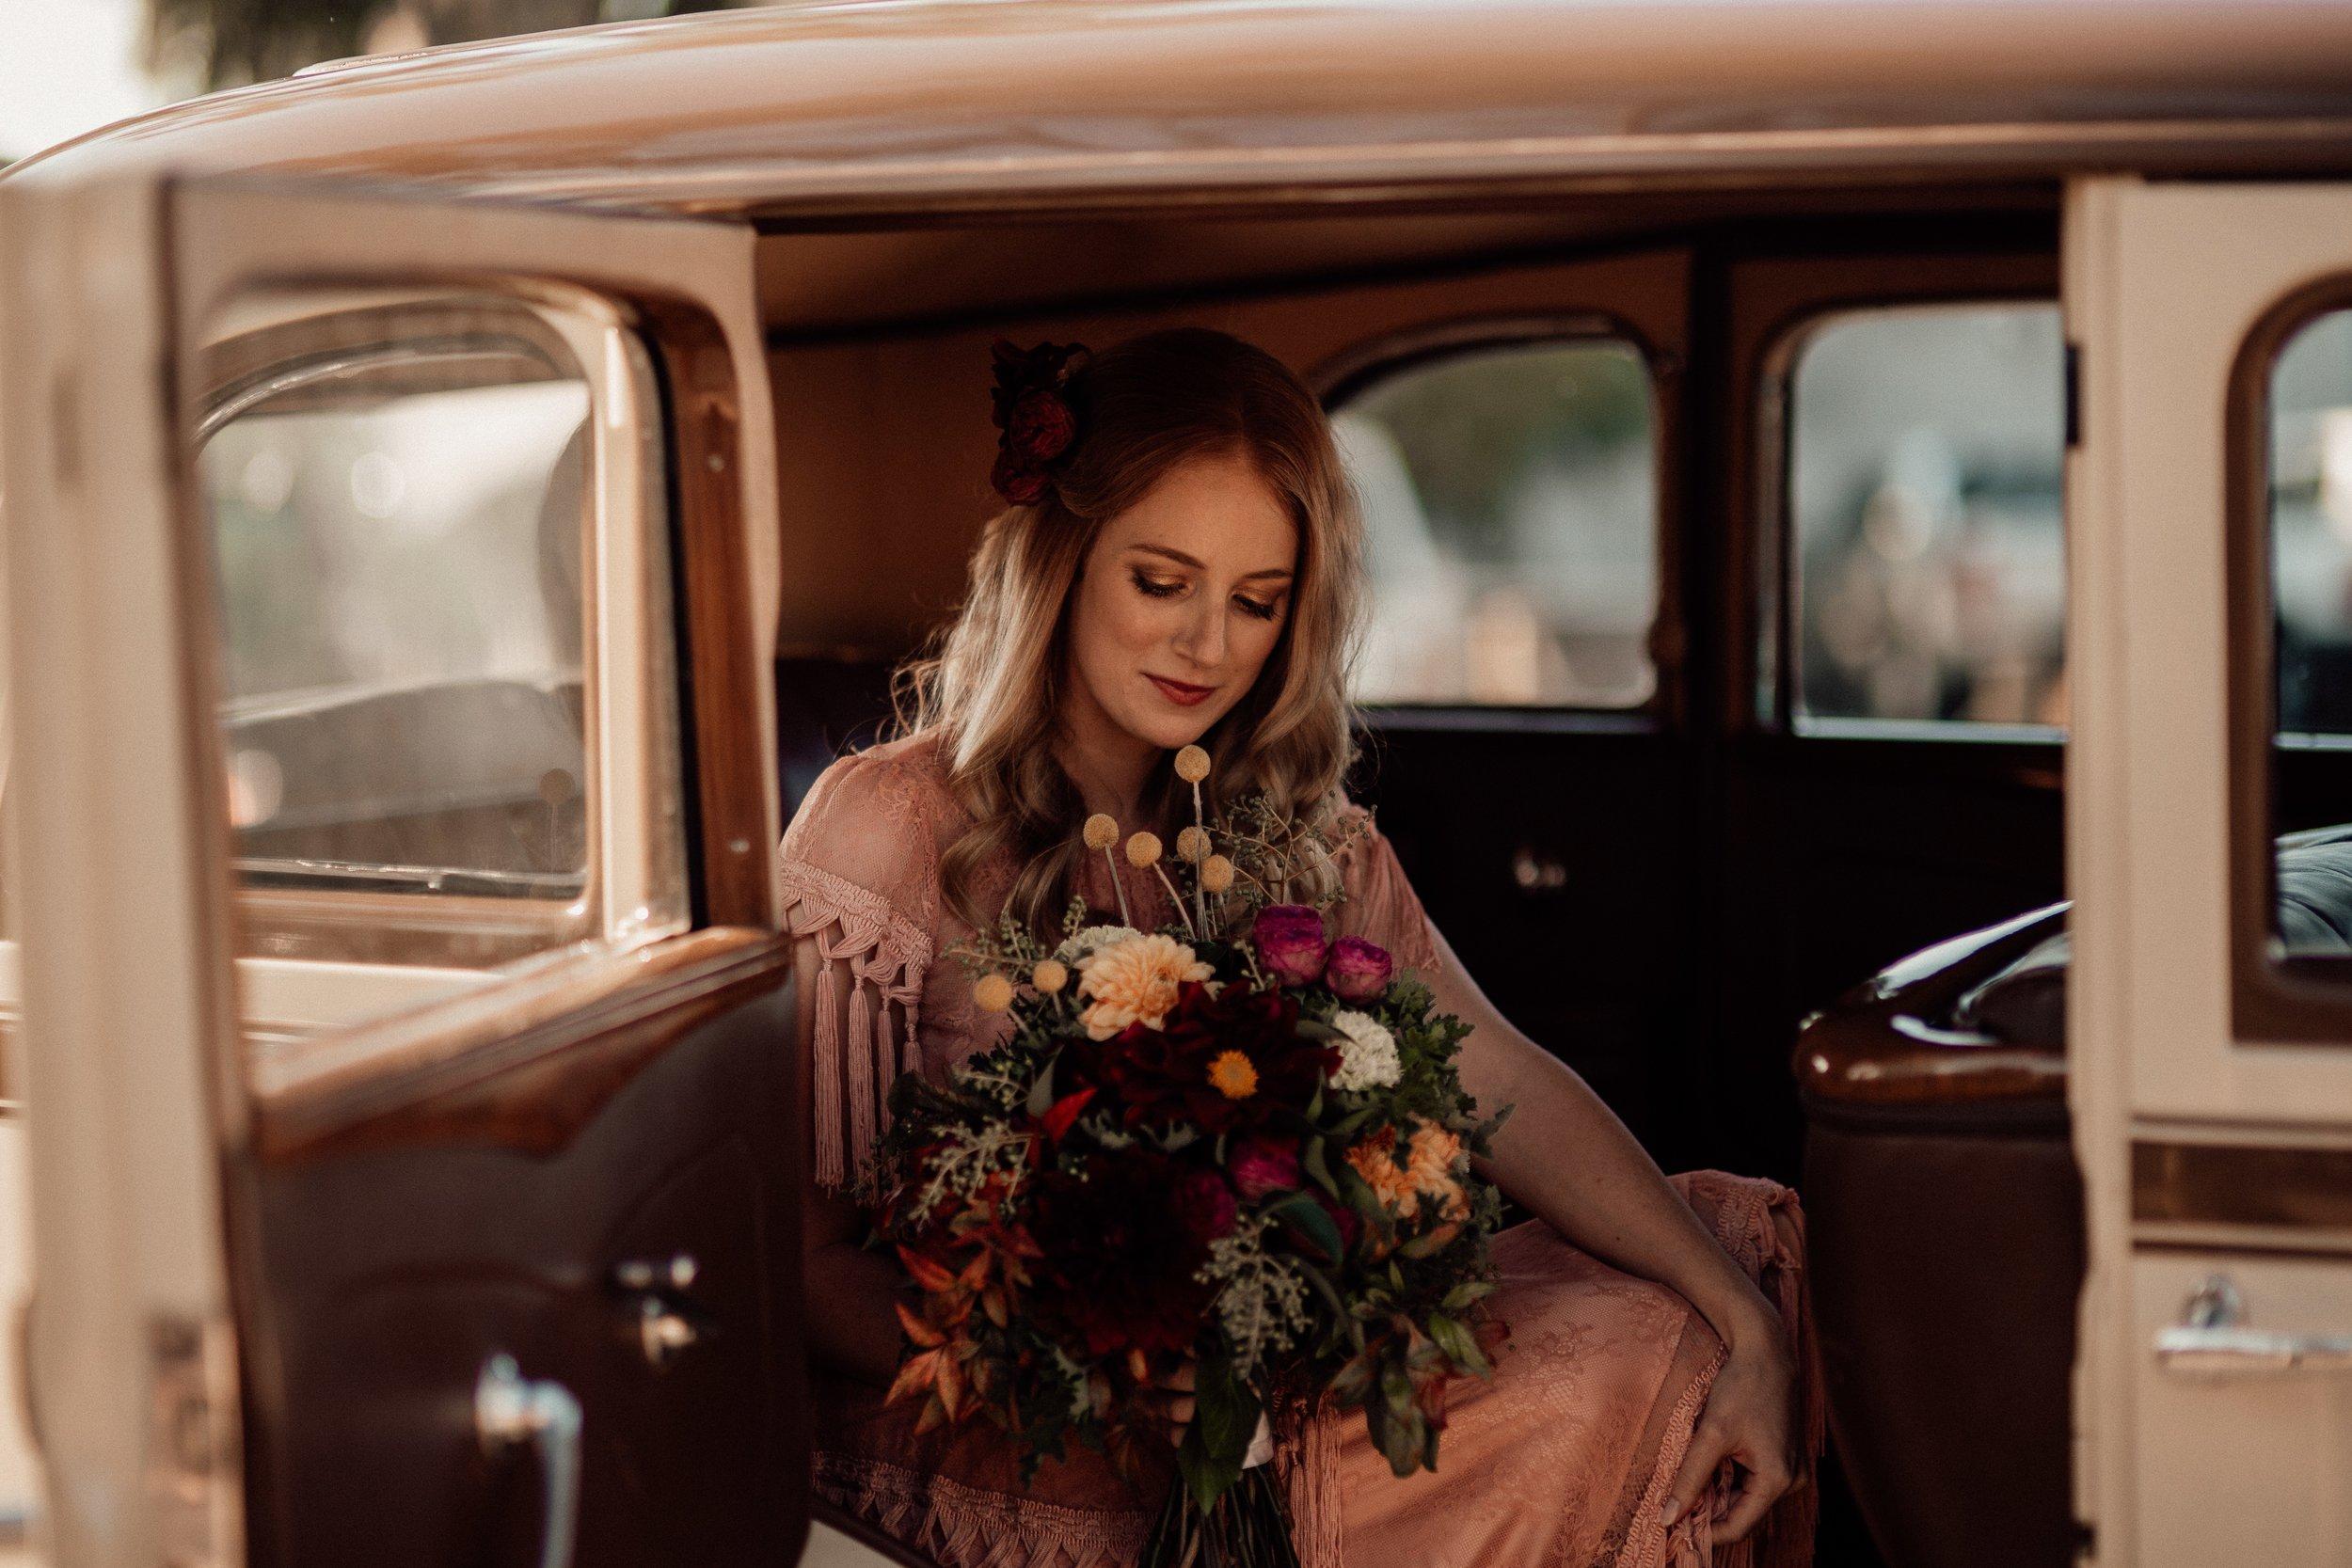 mickalathomas_puremacphotography_weddingphotographer_couplephotographer_Sheppartonphotographer_2127.jpg